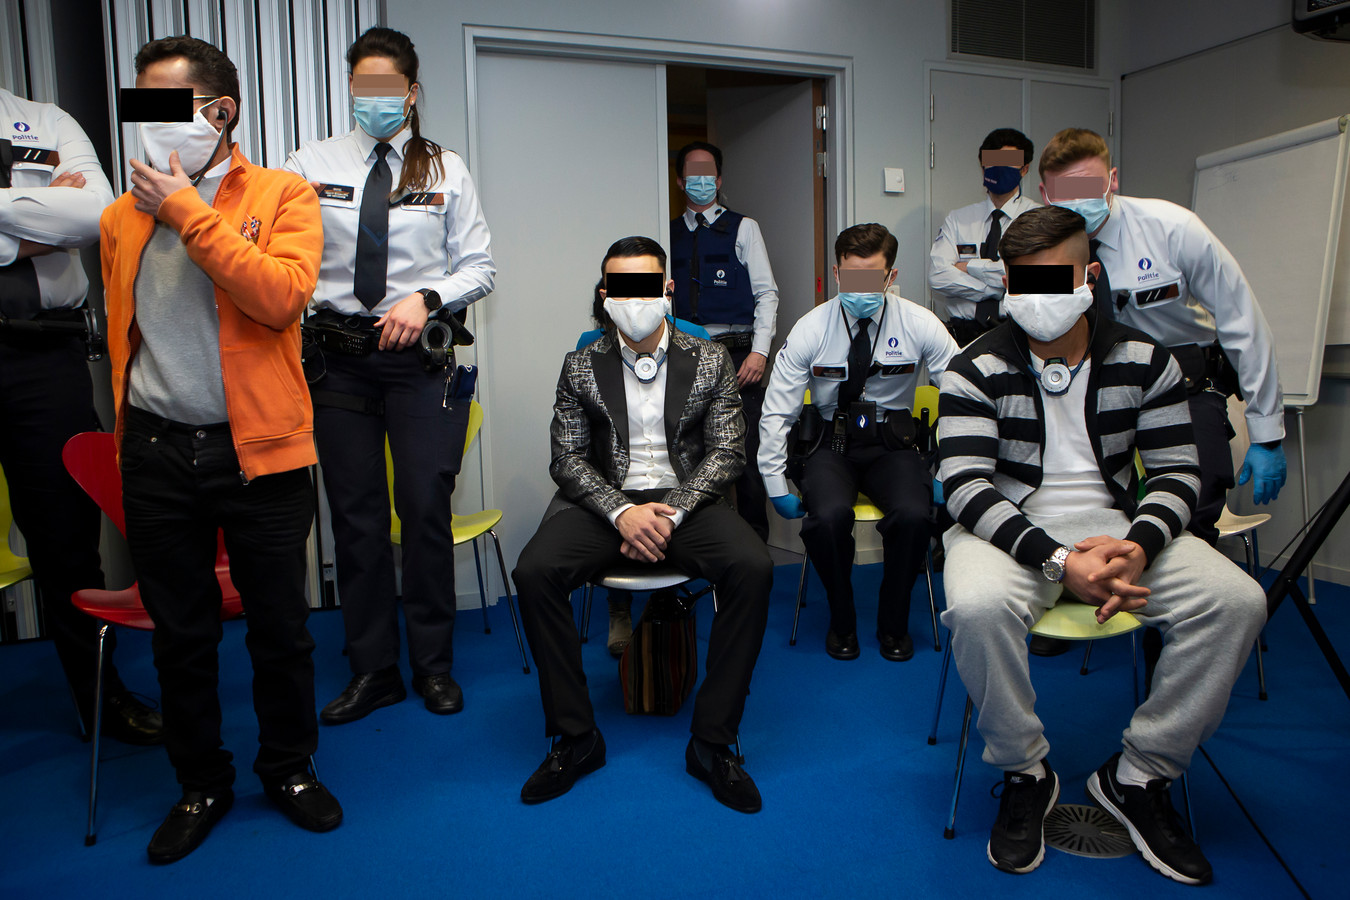 Beschuldigden Sorin Varga, Sergiu Covaci en Fernando-Marius Covaciu